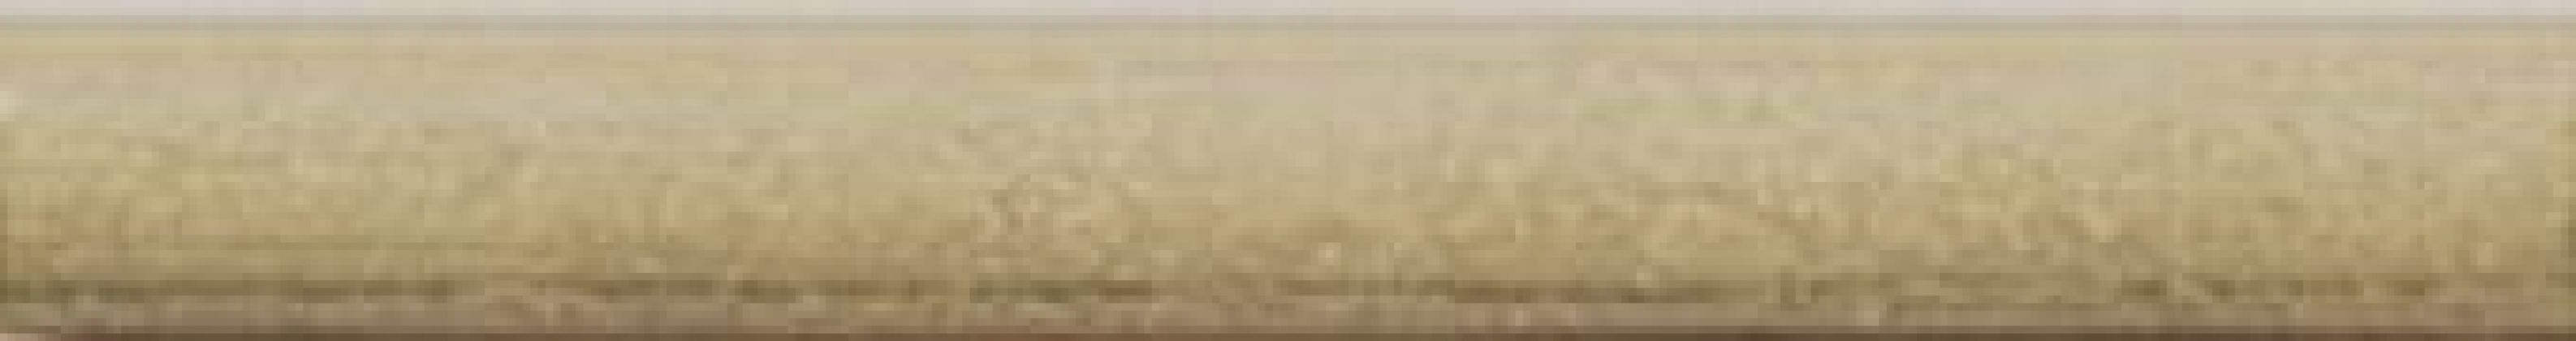 TORELO CHIC BEIGE 2x15